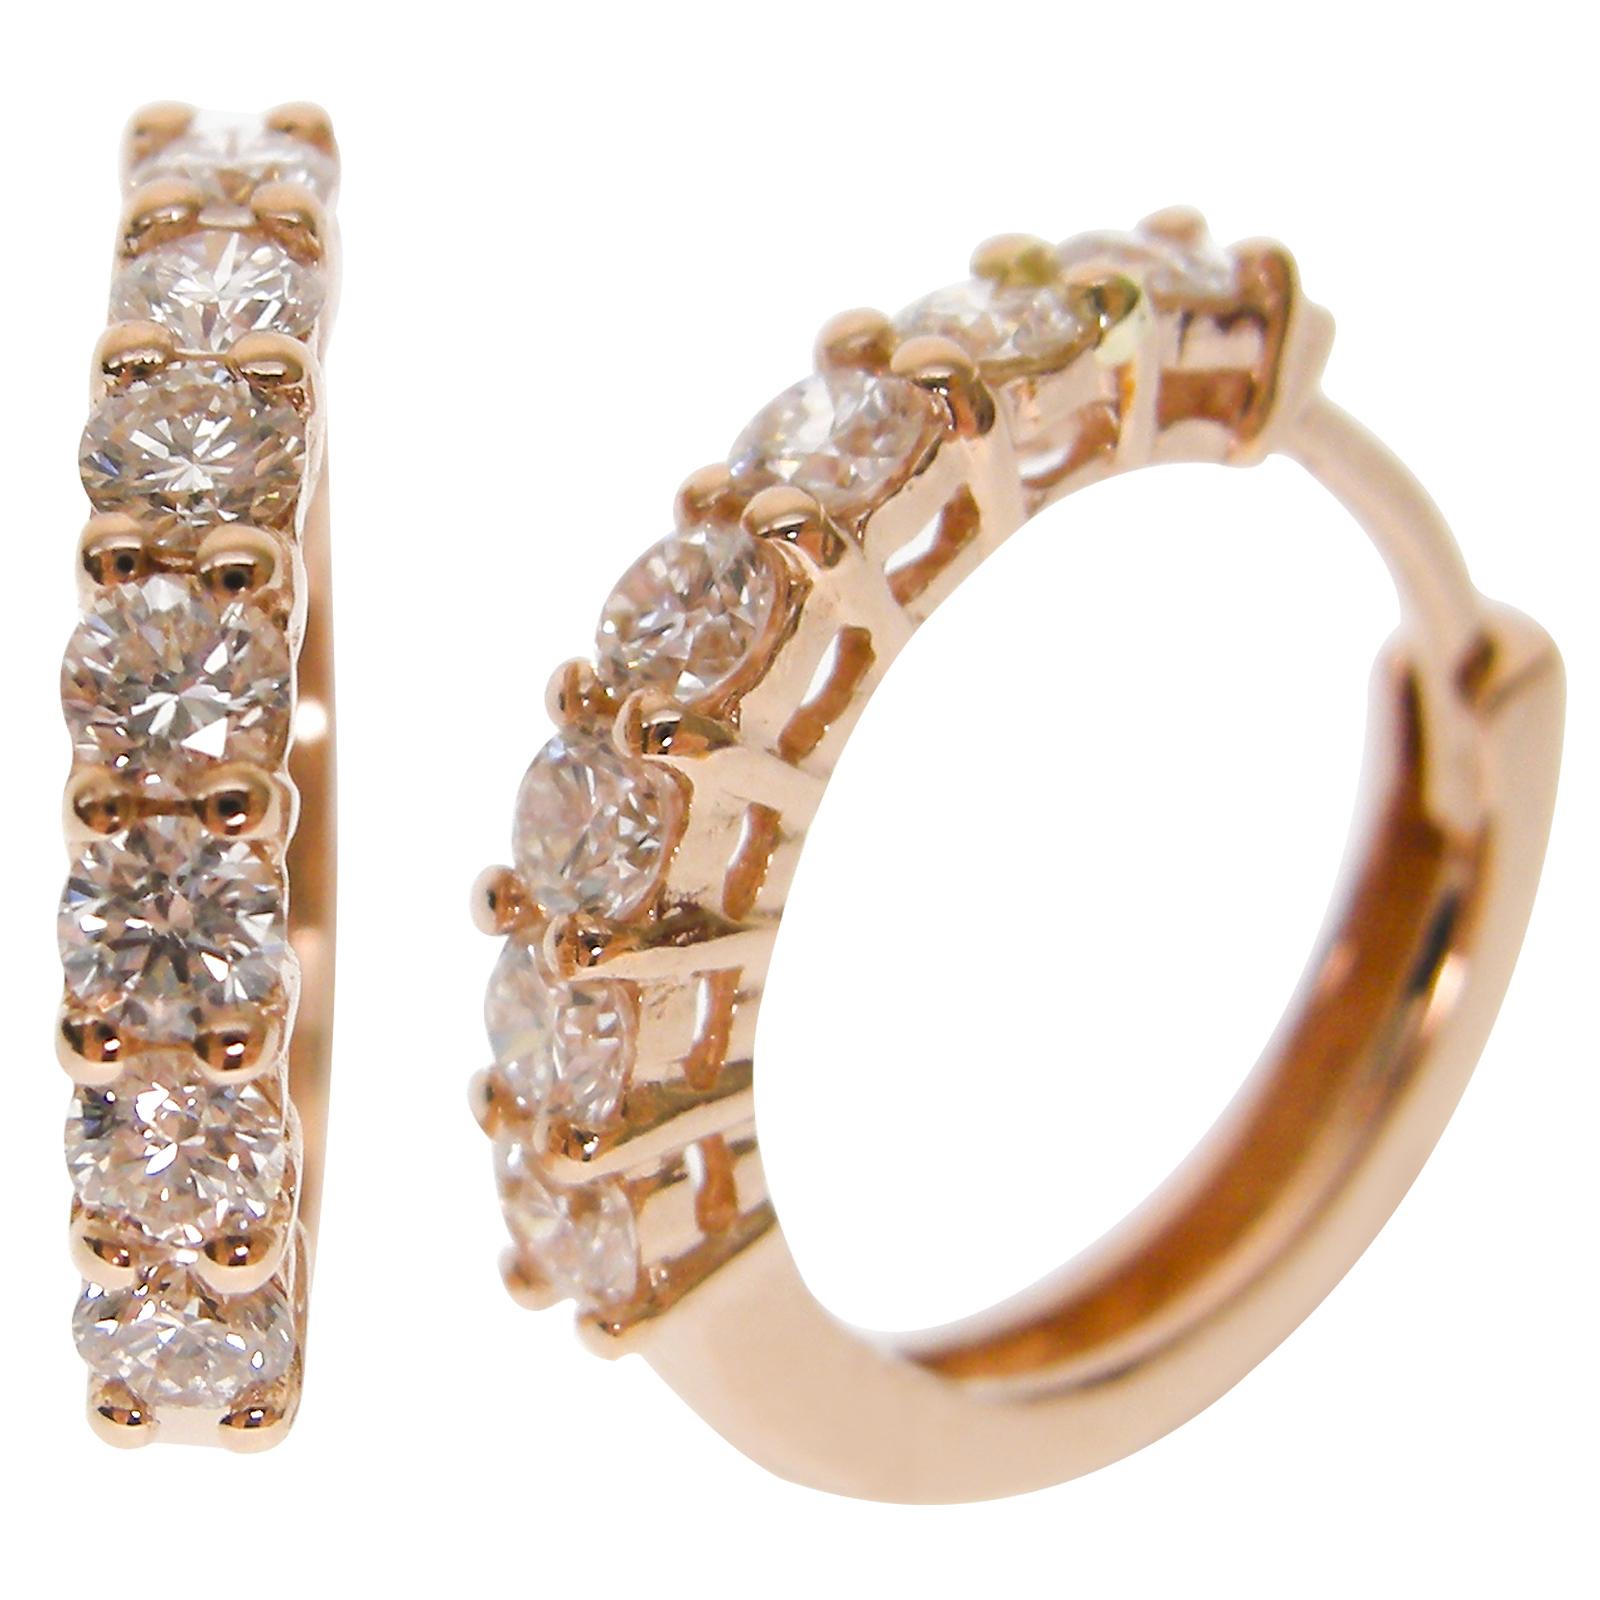 CLASSIC DIAMOND EAR HUGGIES CLUSTER DIAMOND PENDANT BESPOKE FINE JEWELLERY BY SHAHINA HATTA